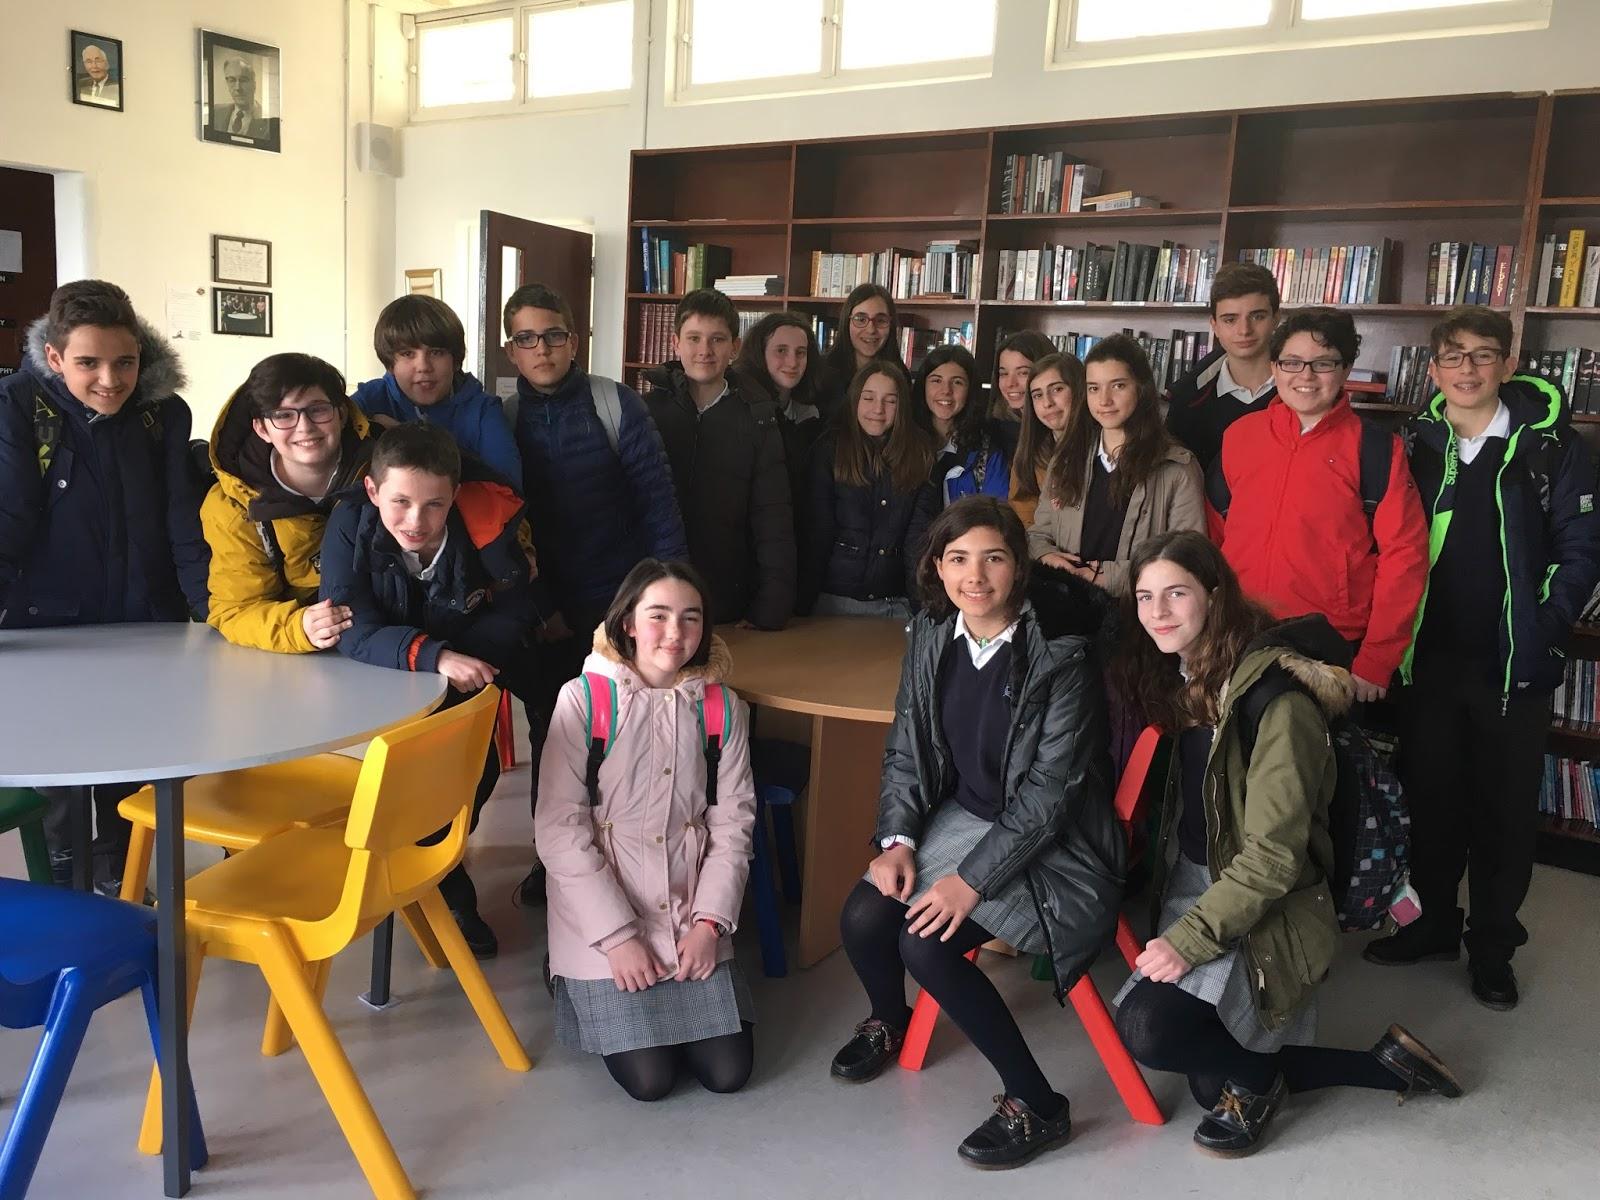 Agustinas Valladolid - 2017 - ESO 1 2 - Irlanda 2